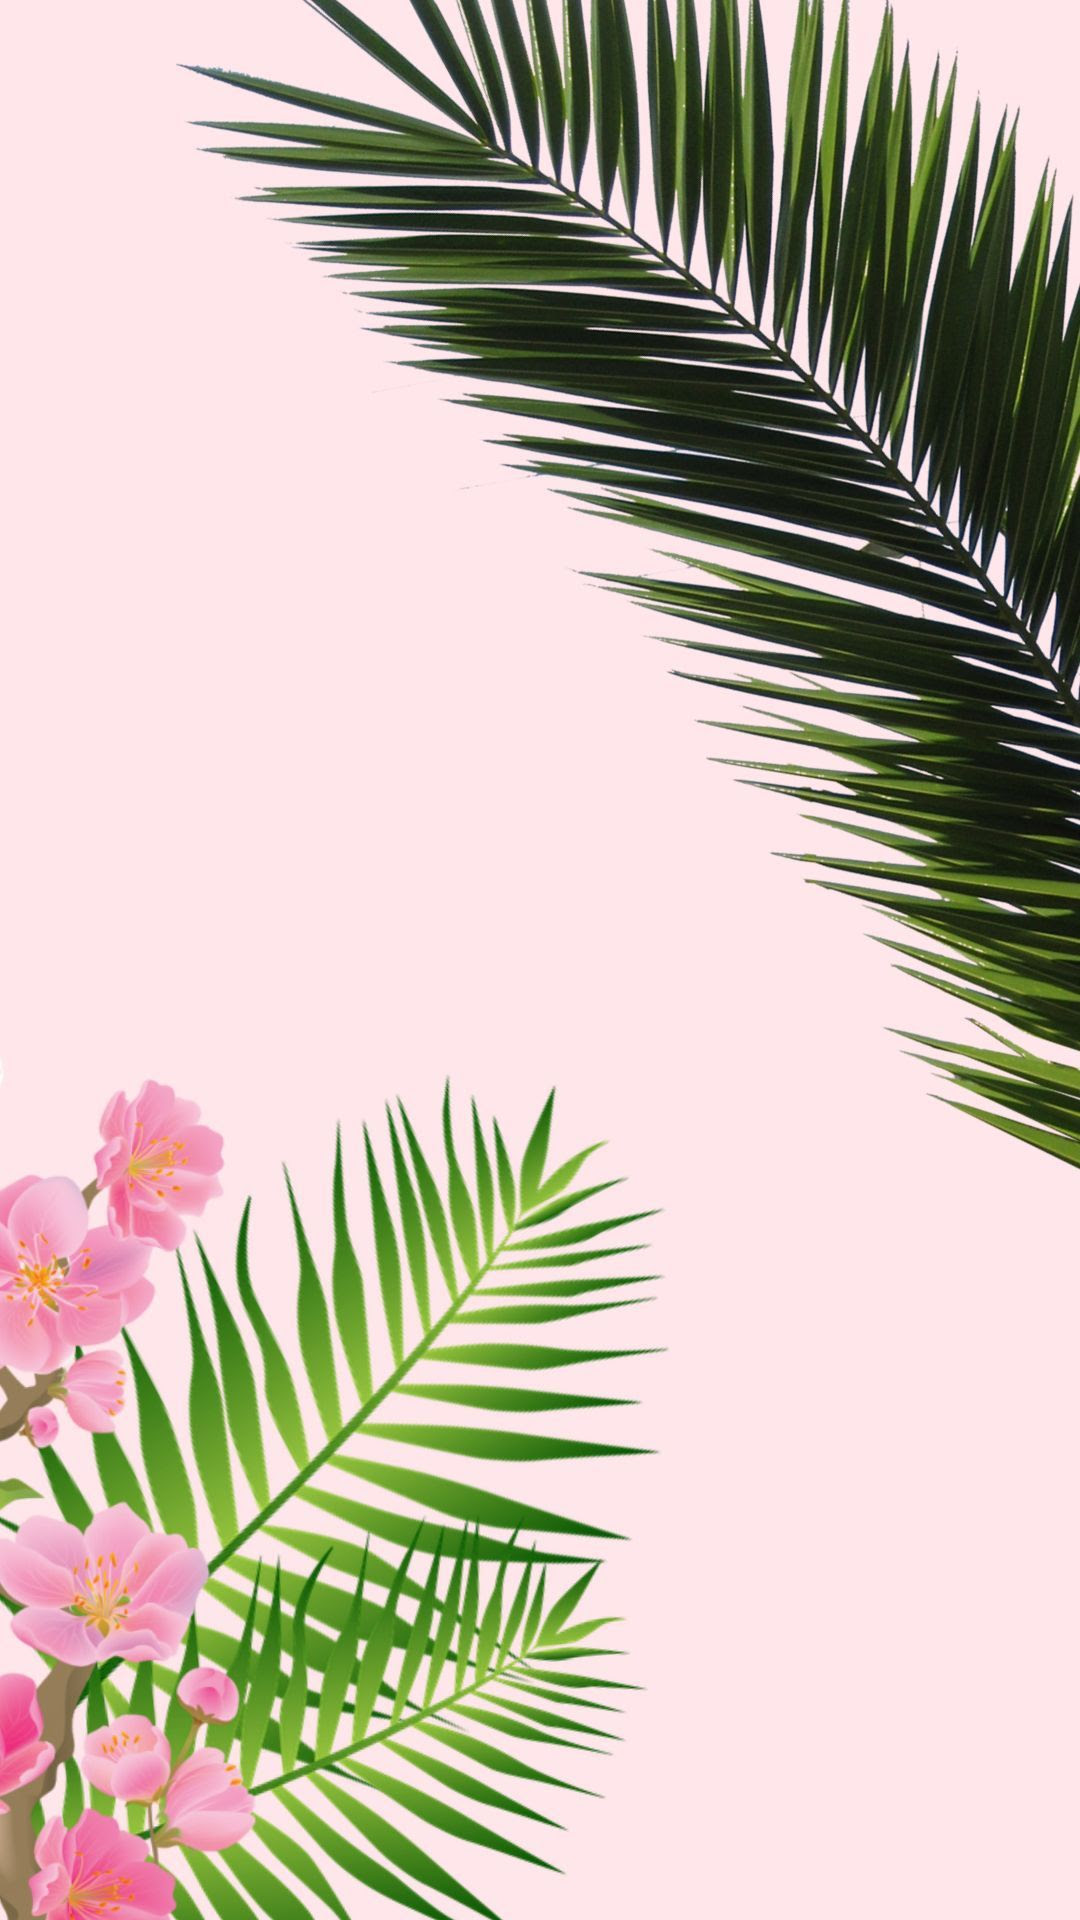 Download 40+ Wallpaper Iphone Elegant Foto HD Gratid